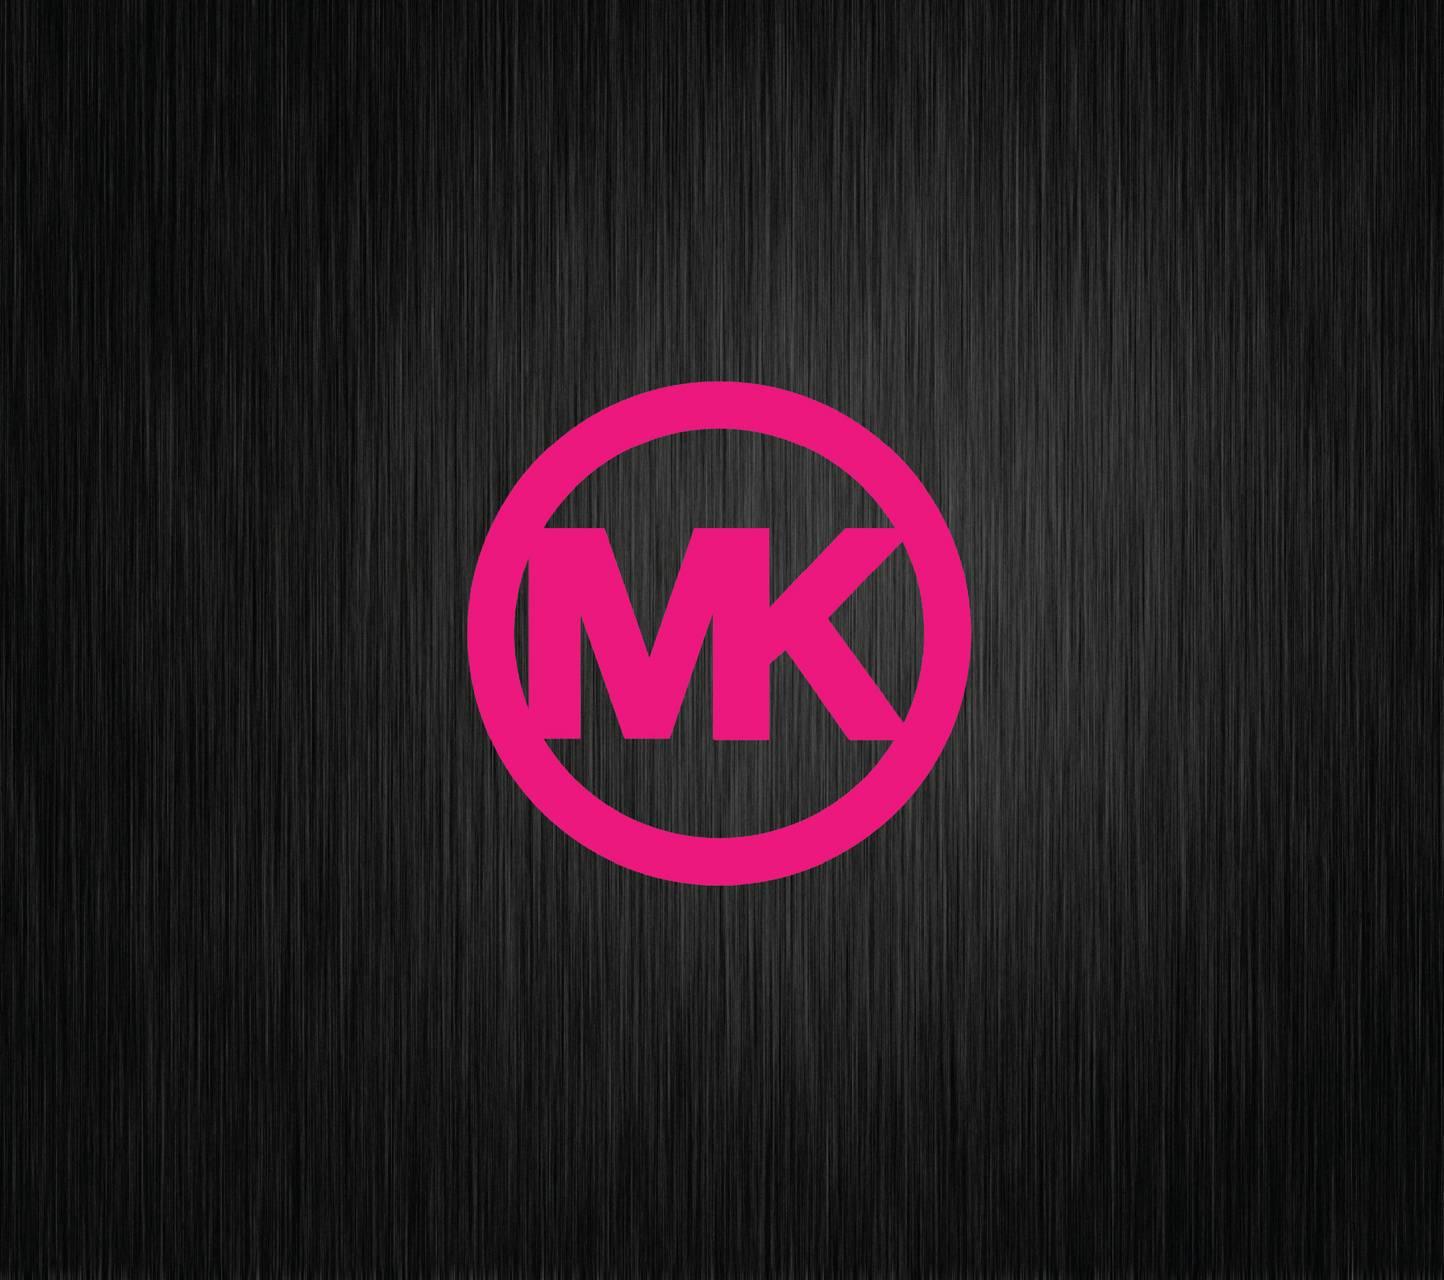 Michael Kors Logo wallpaper by